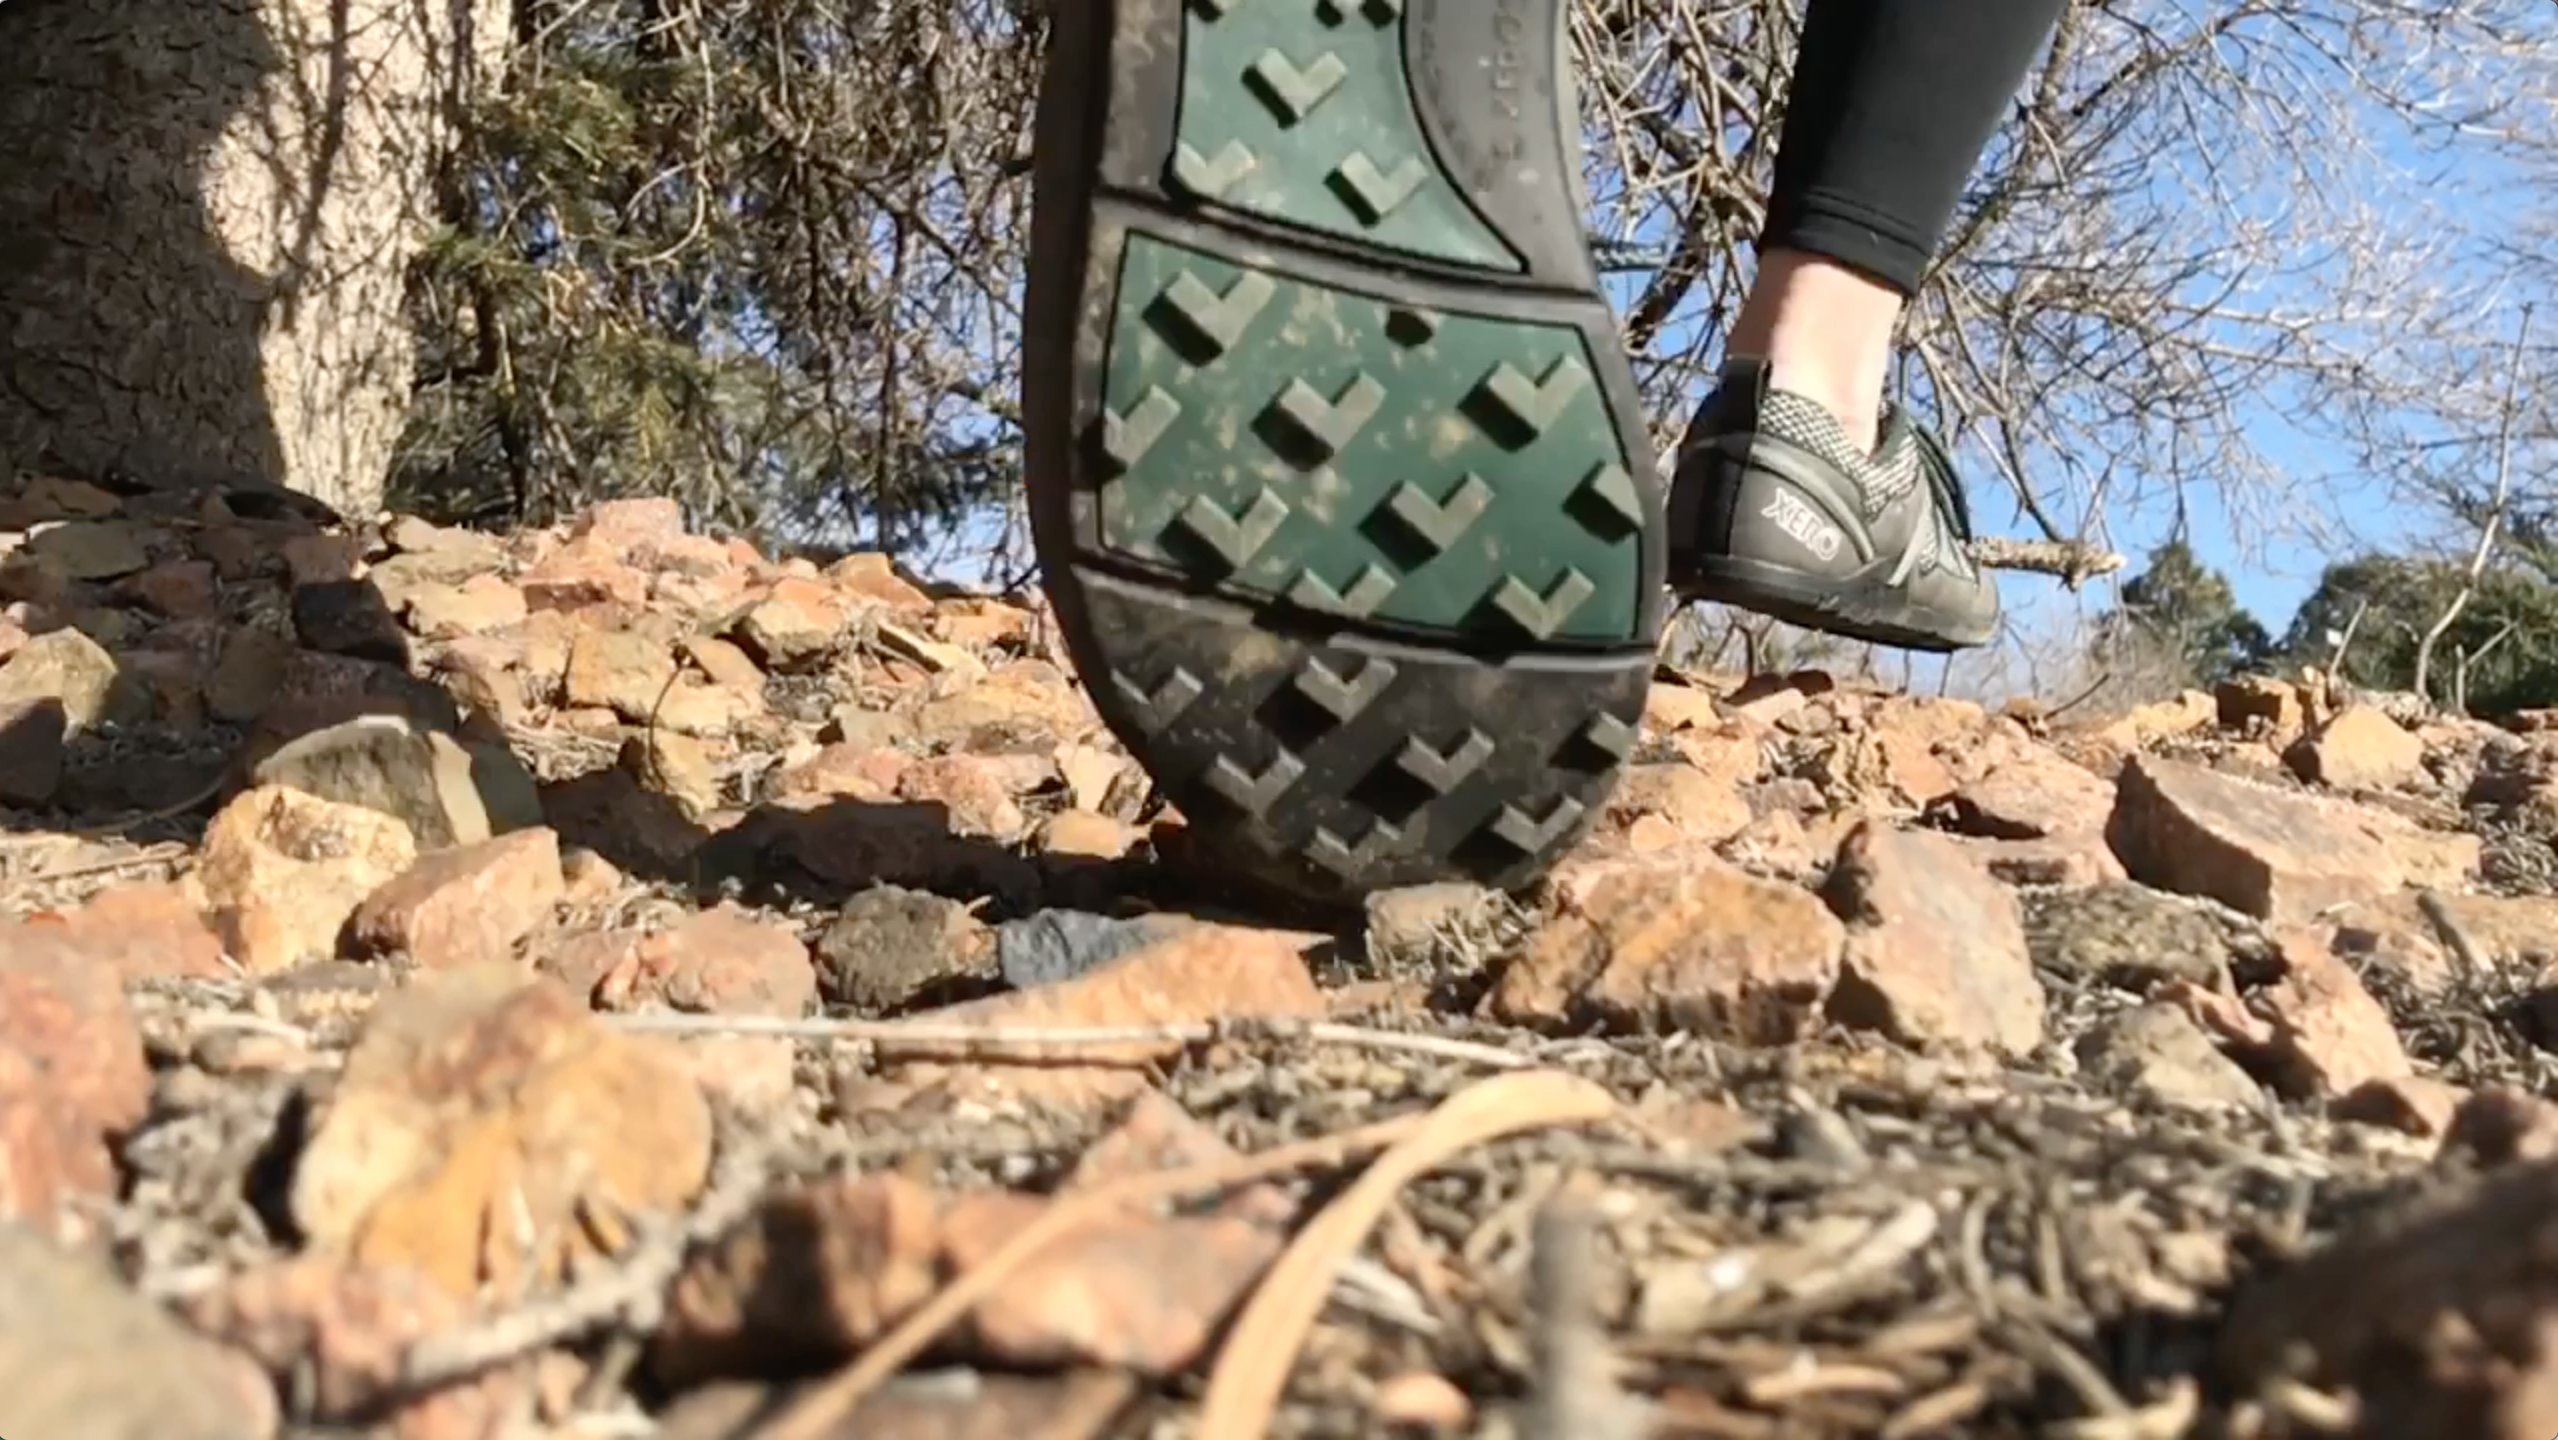 Xero Shoes TerraFlex - Women's Trail Running and Hiking Shoe - Barefoot-Inspired Minimalist Lightweight Zero-Drop - Black by Xero Shoes (Image #5)